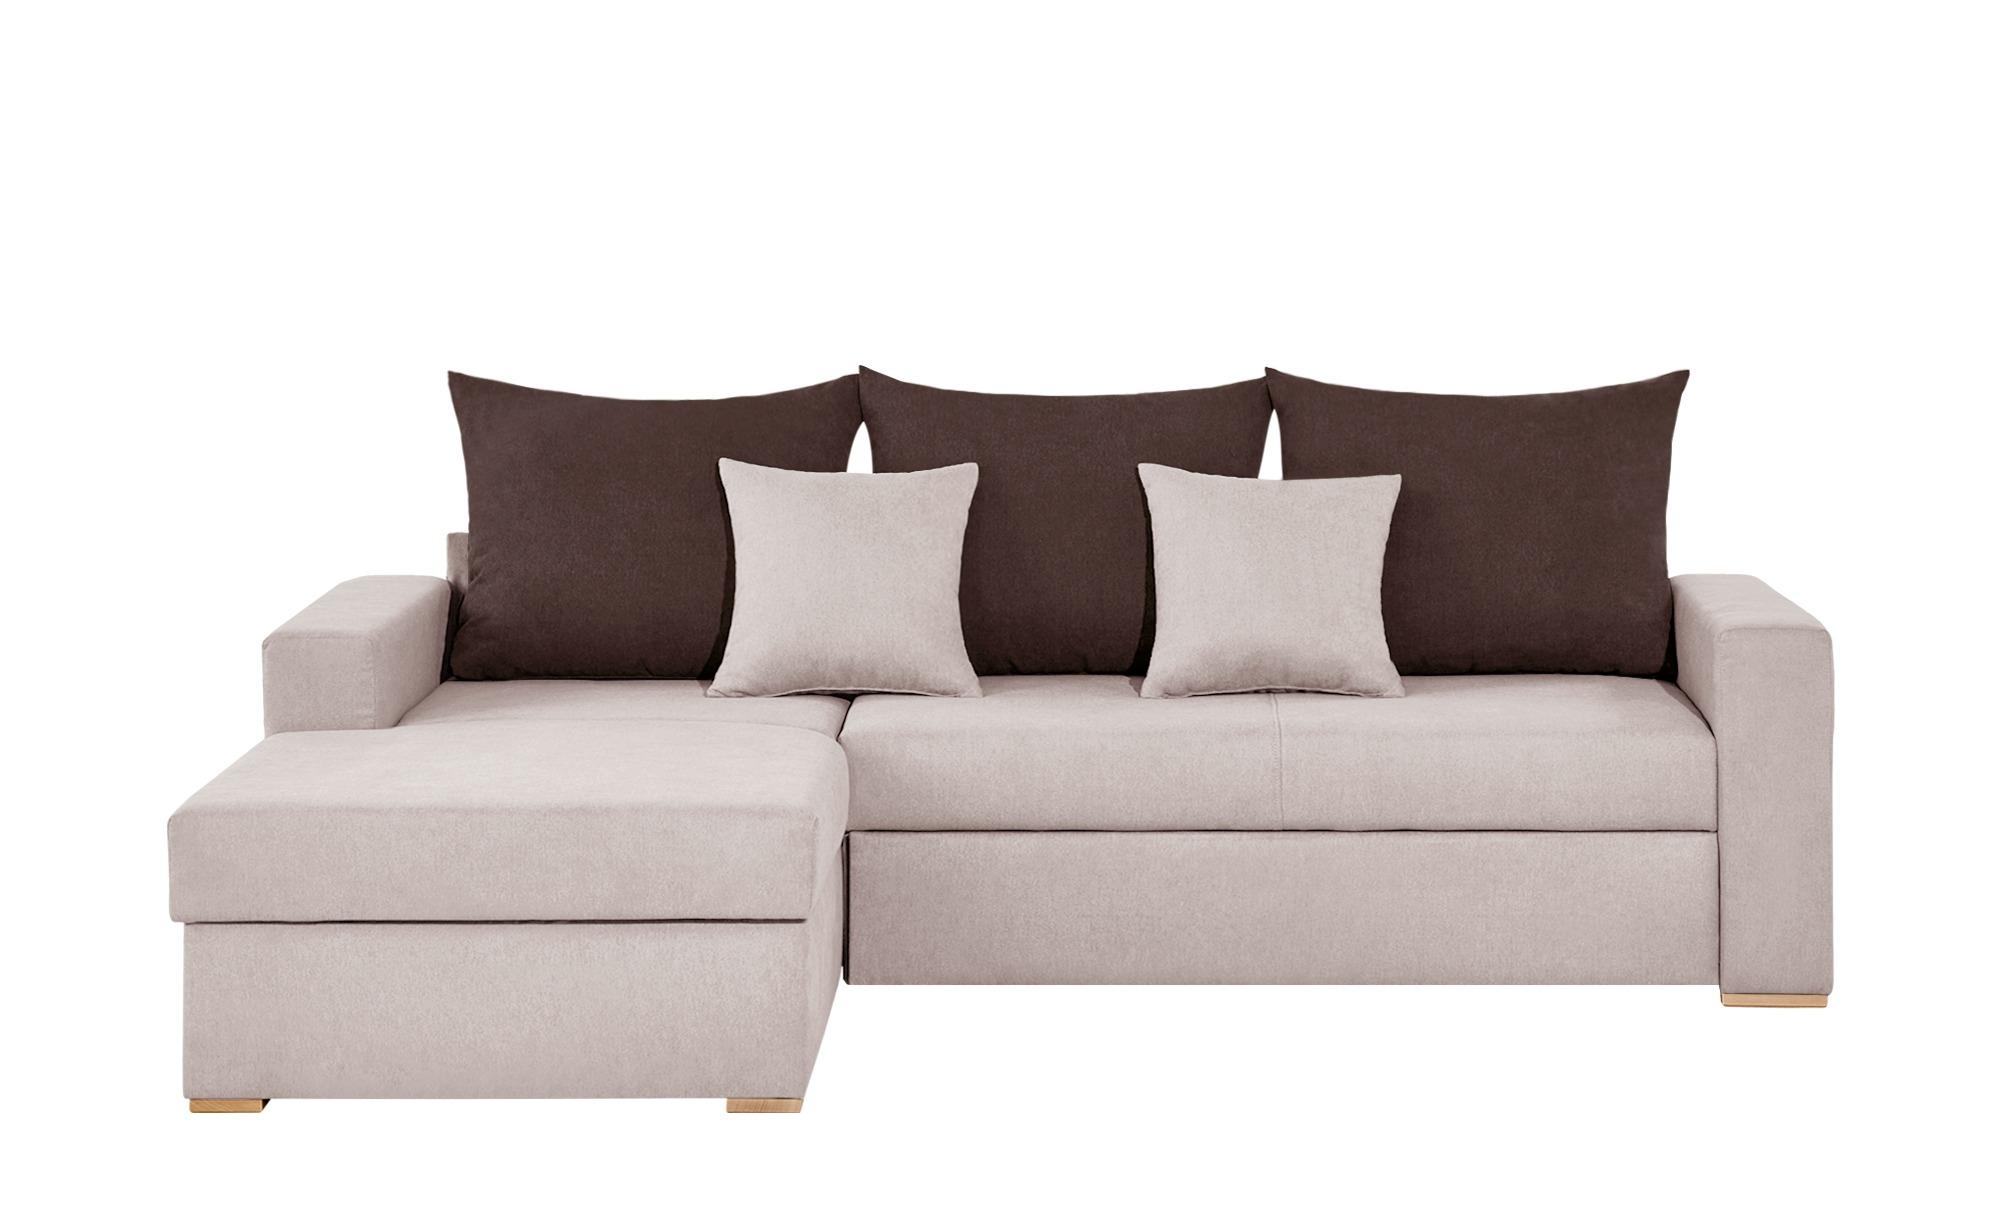 Smart ecksofa anna breite h he 65 cm braun online kaufen for Ecksofa anna